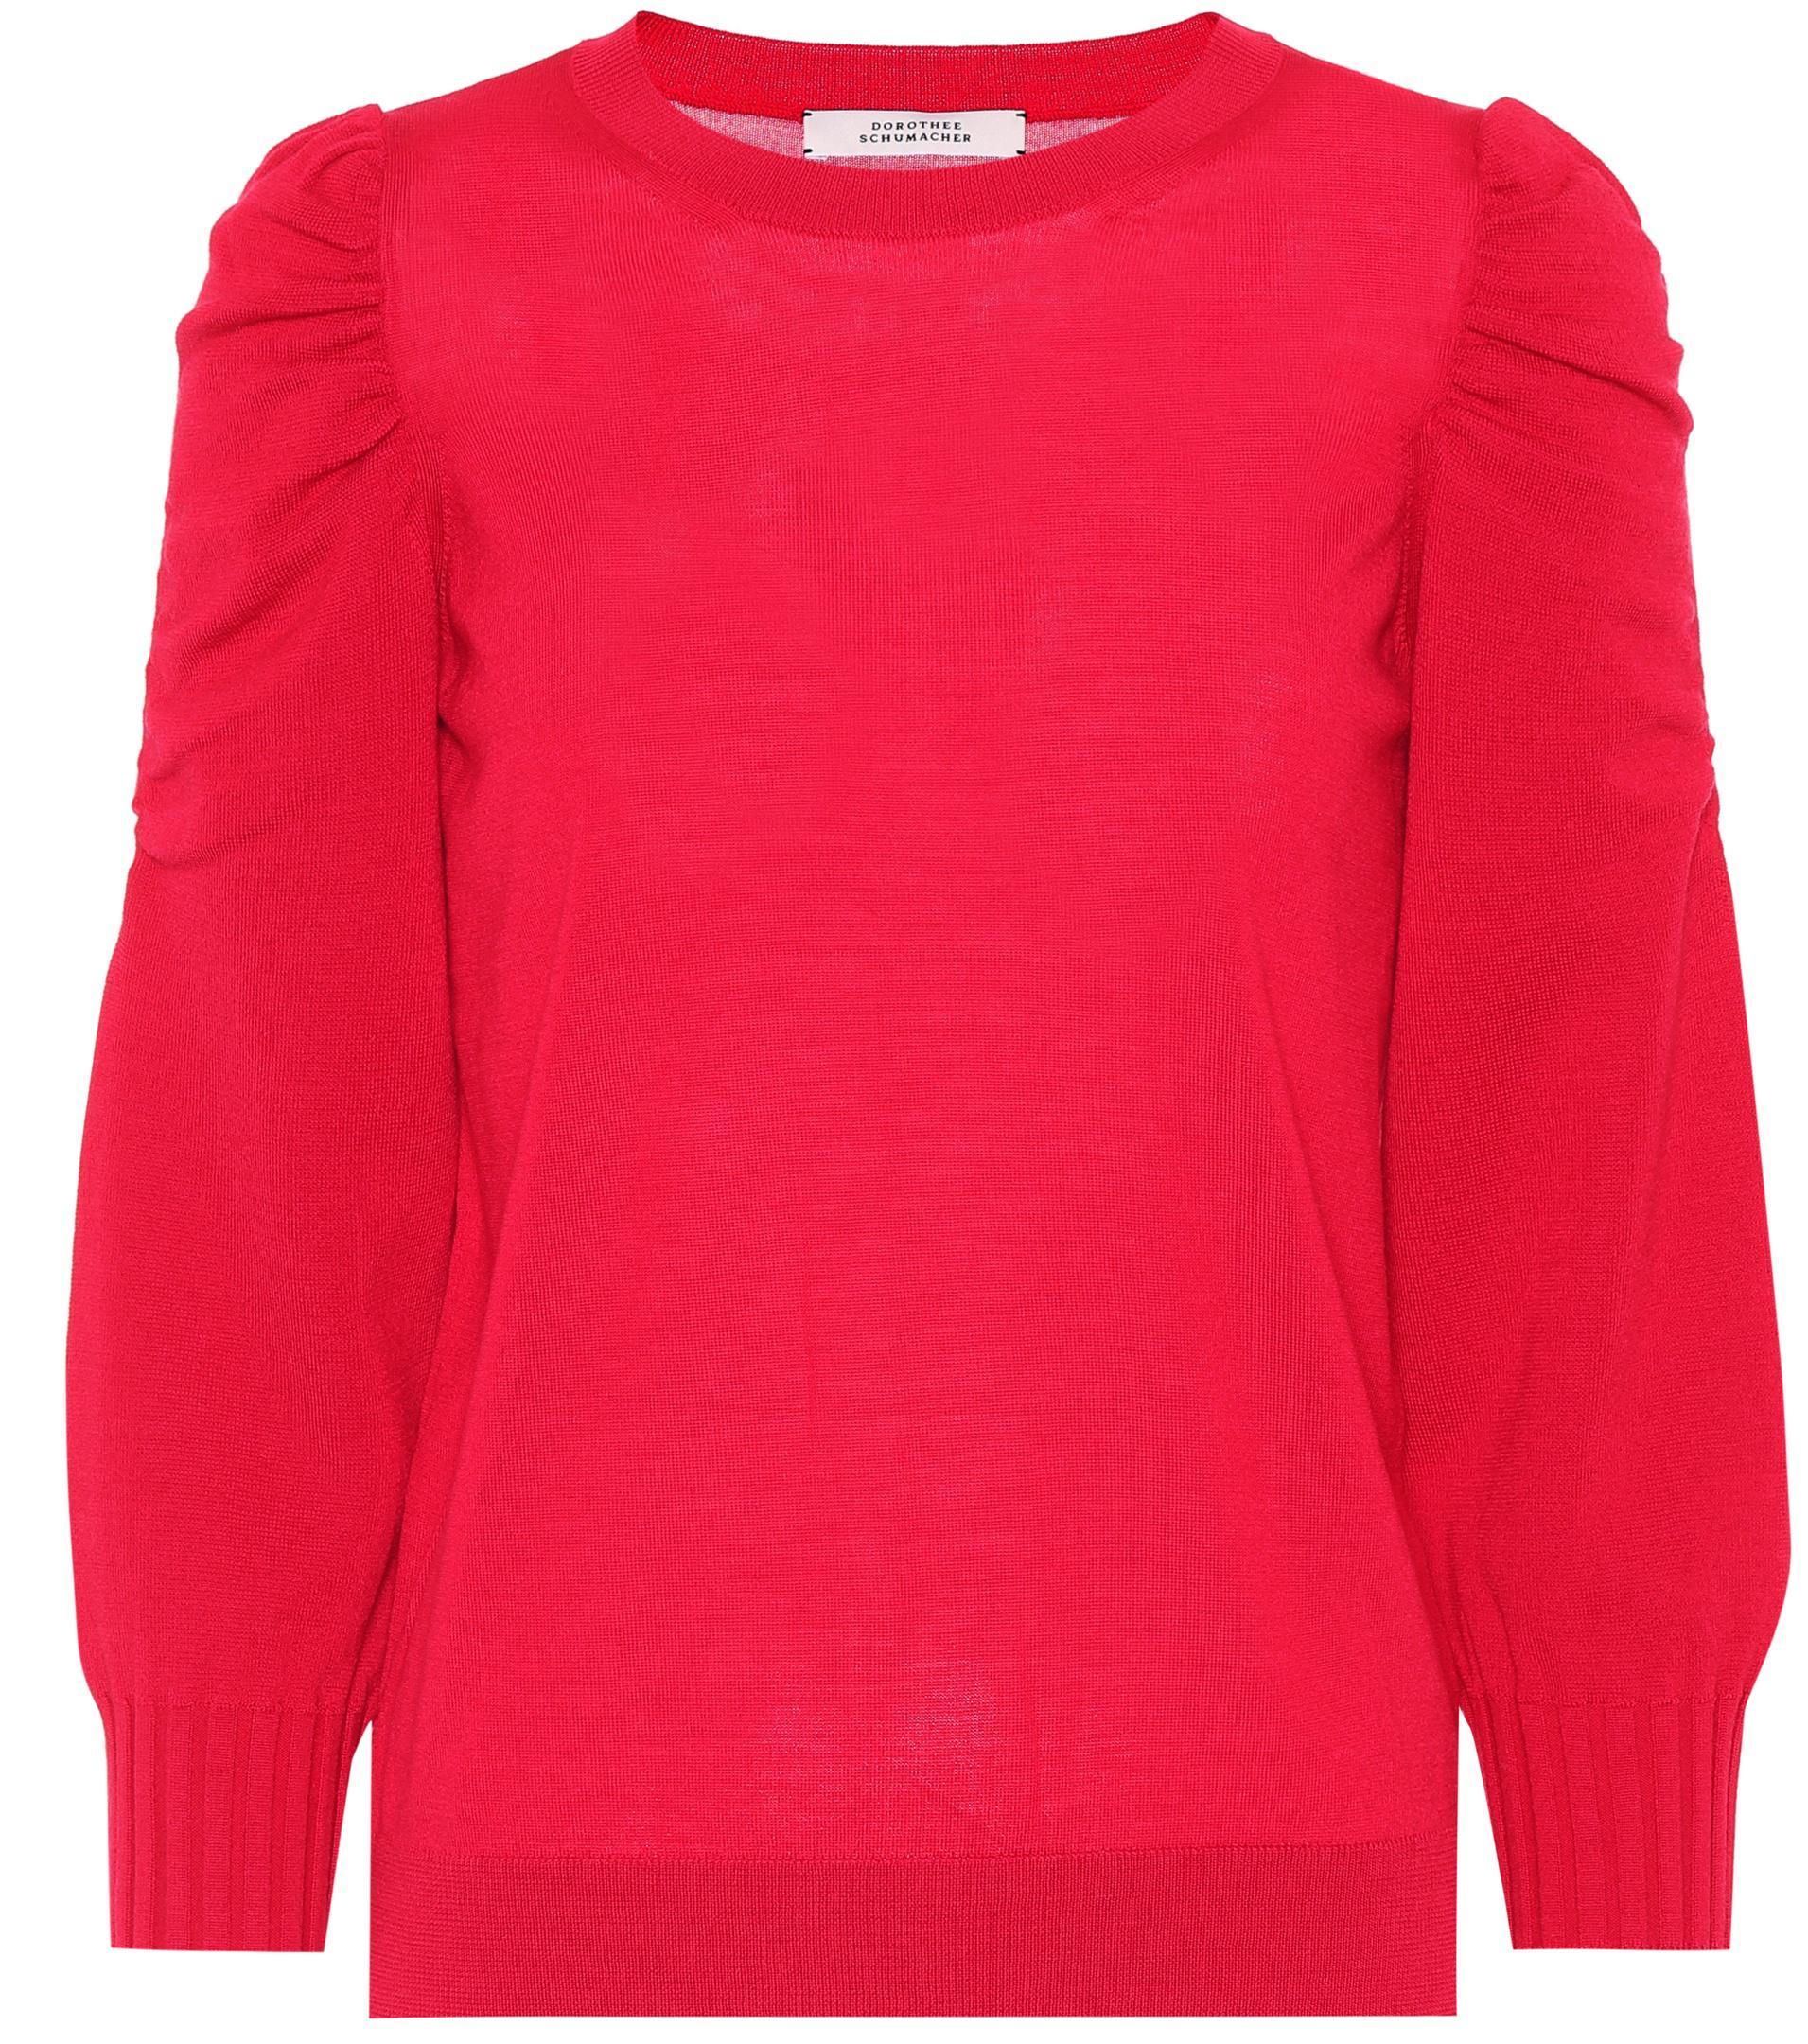 lyst dorothee schumacher tender transit virgin wool sweater in red. Black Bedroom Furniture Sets. Home Design Ideas